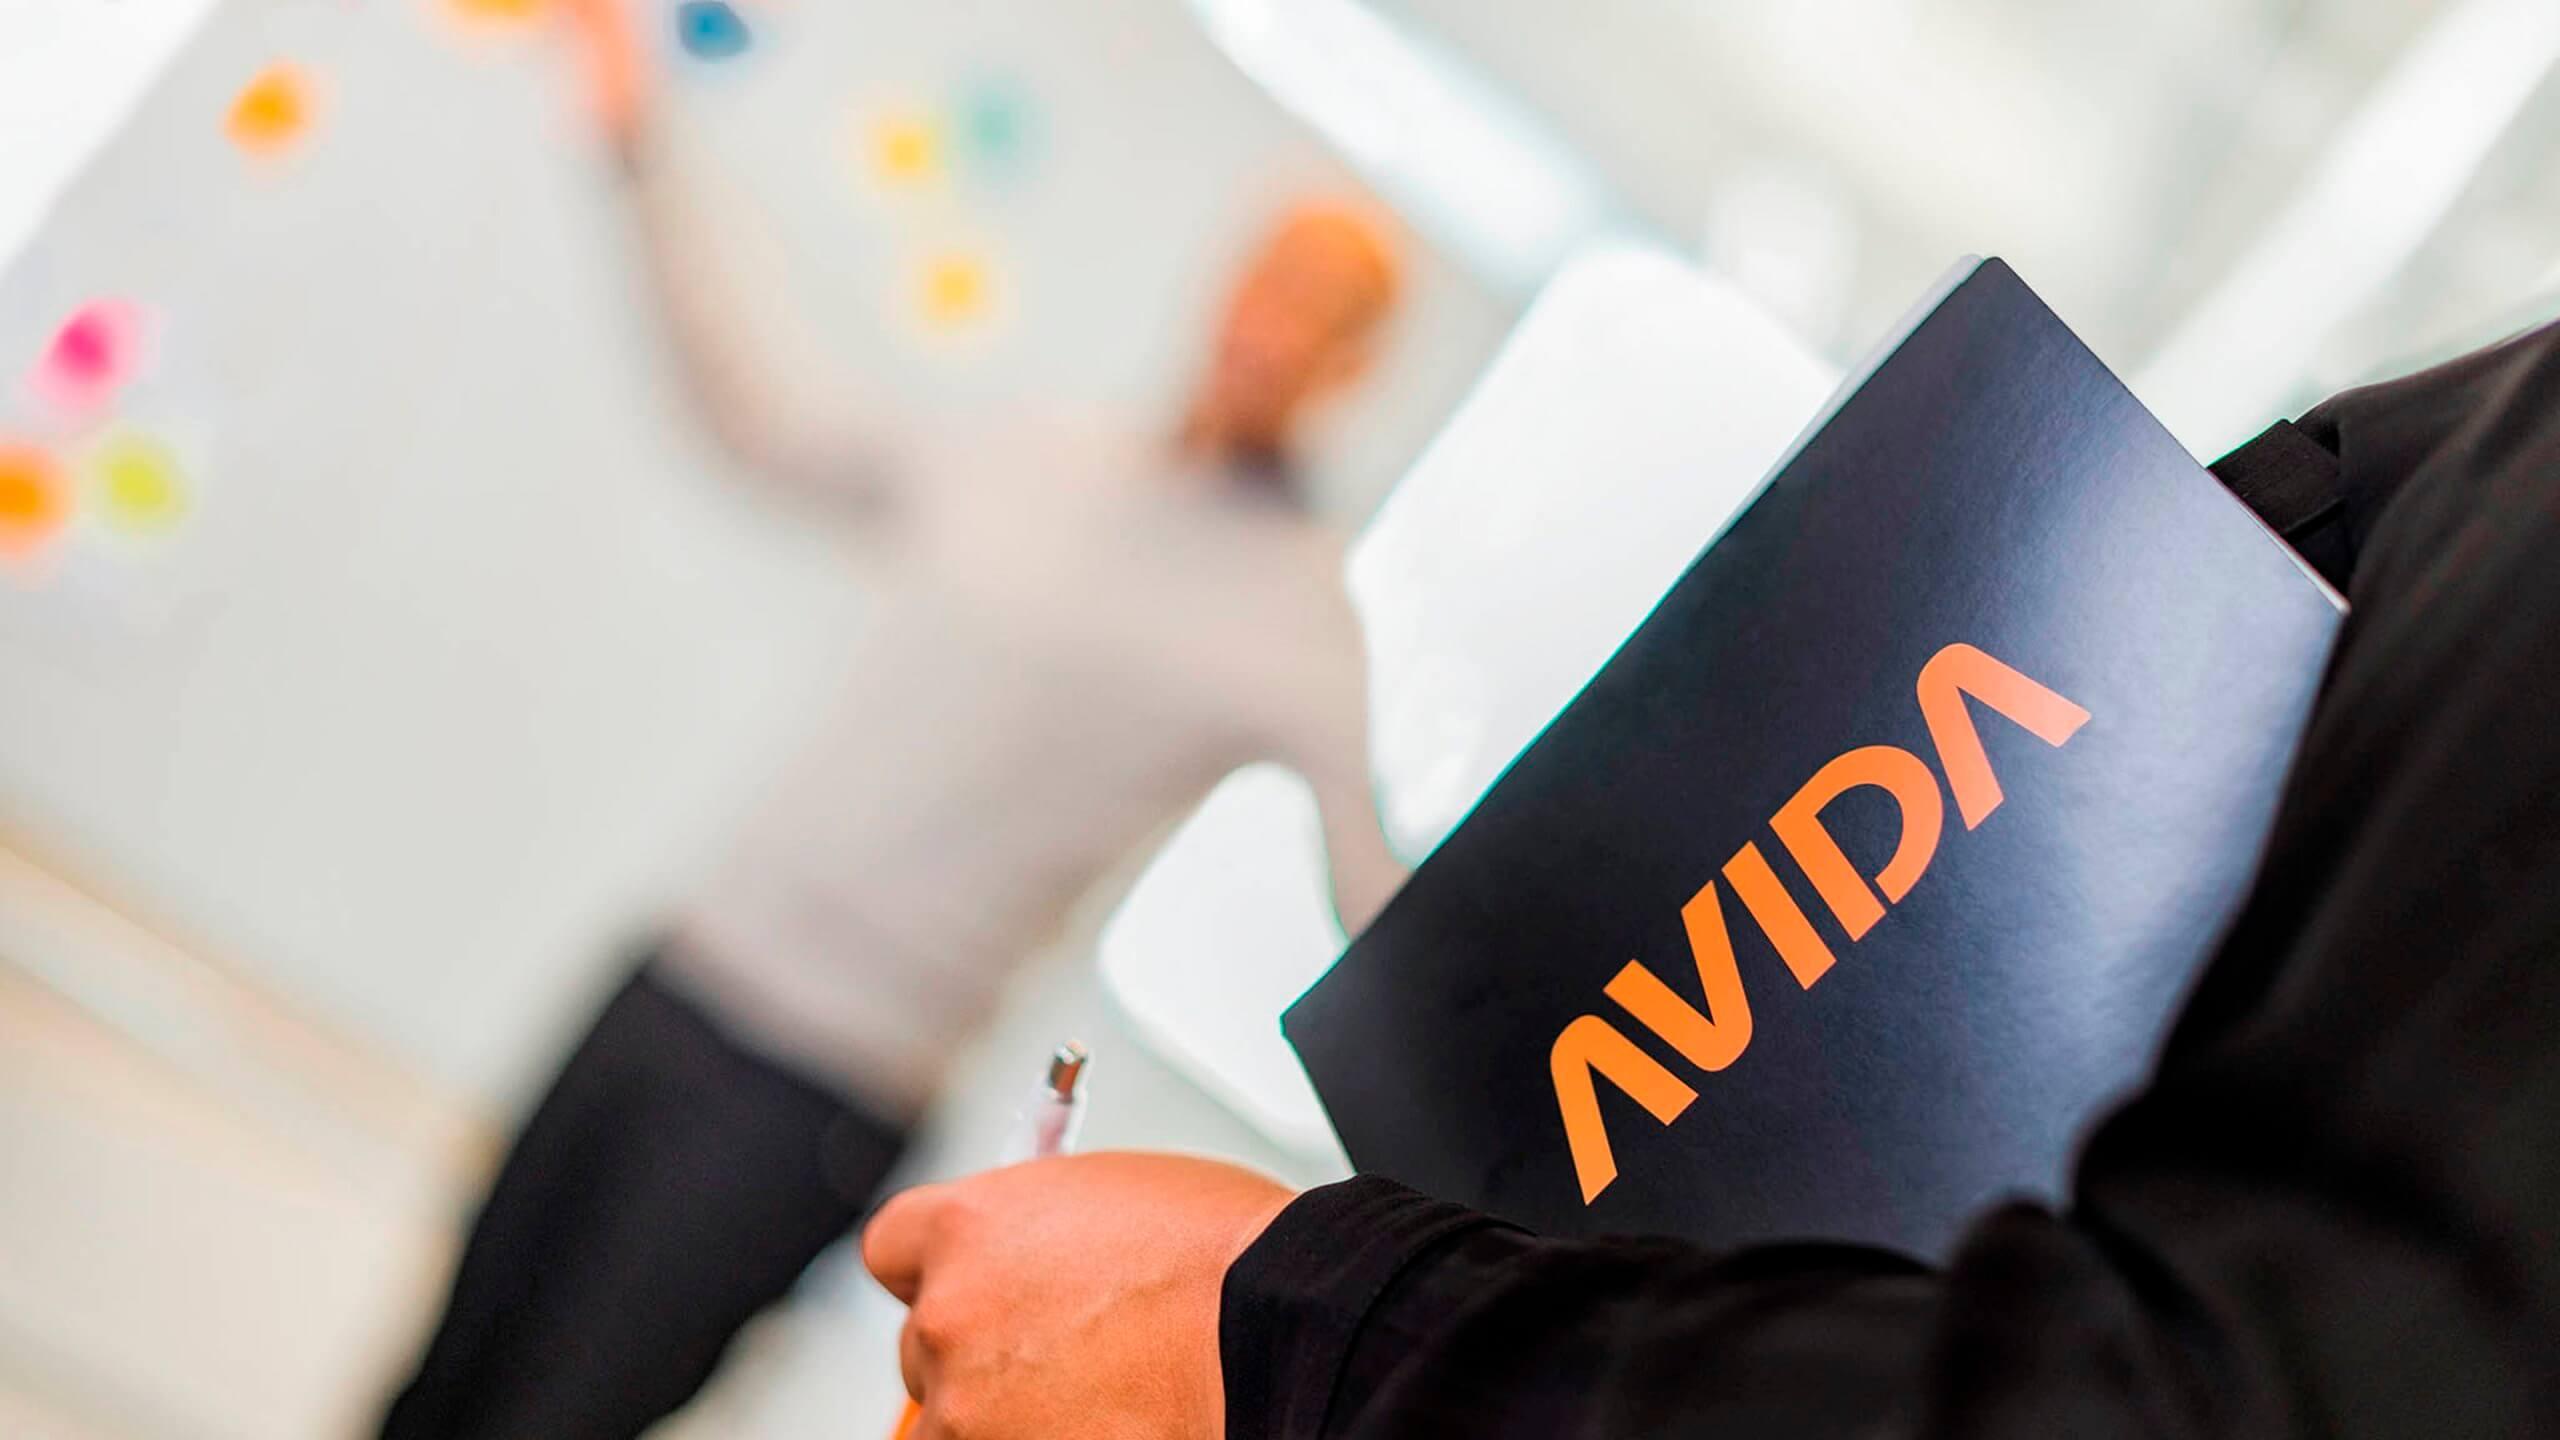 Avida Finans is our new customer